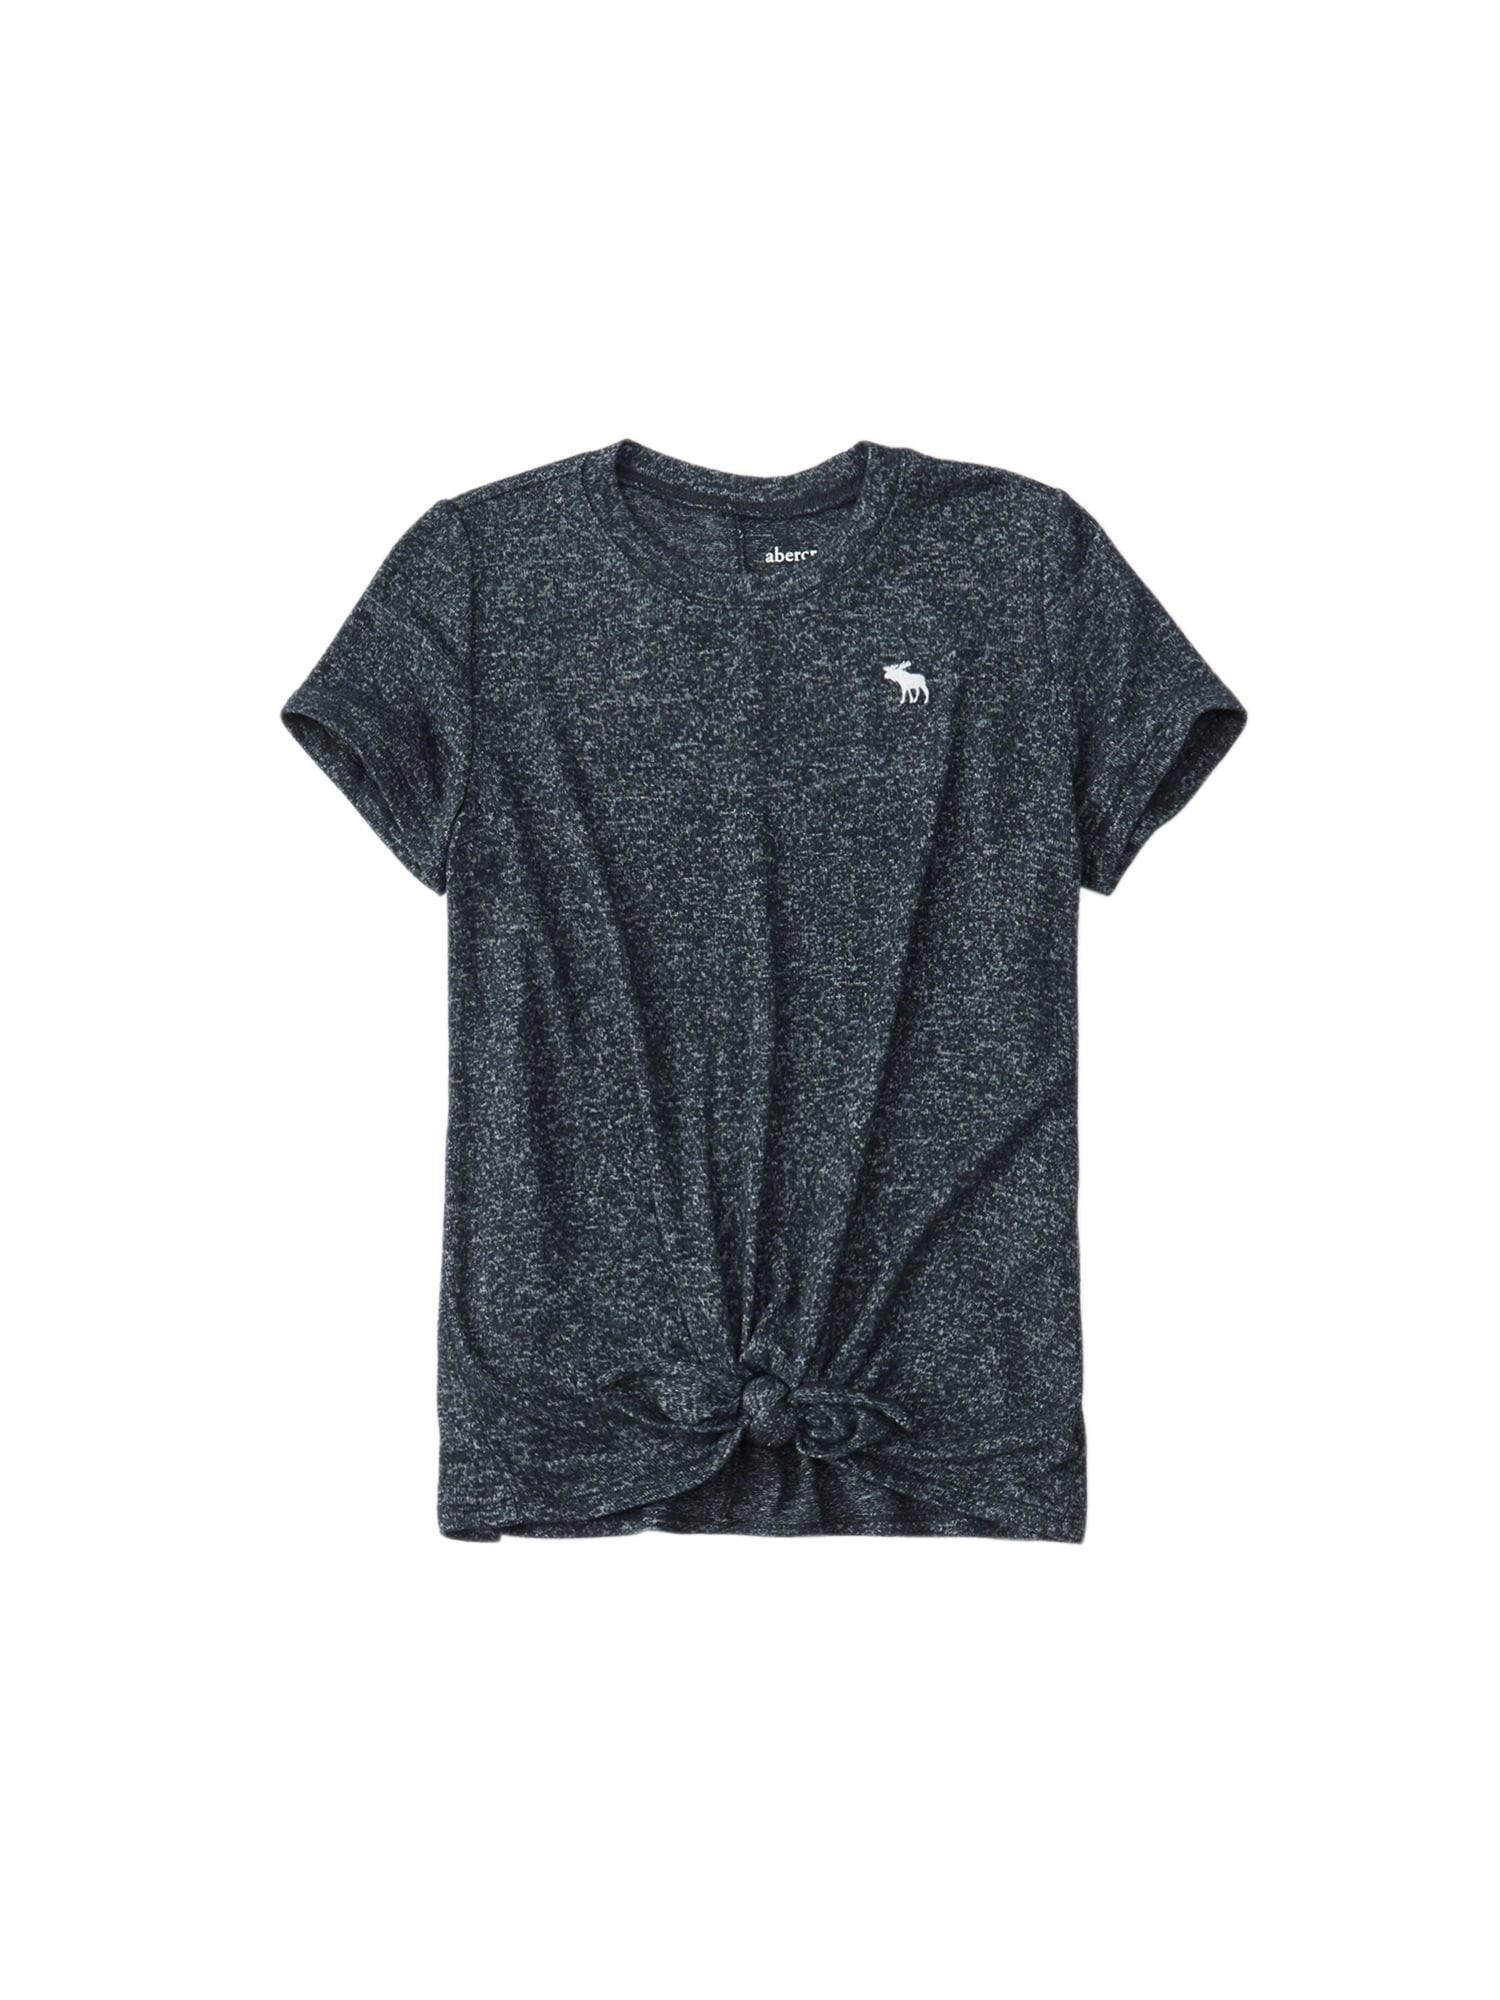 Tričko COZY TIE-FRONT TEE 3CC námořnická modř Abercrombie & Fitch